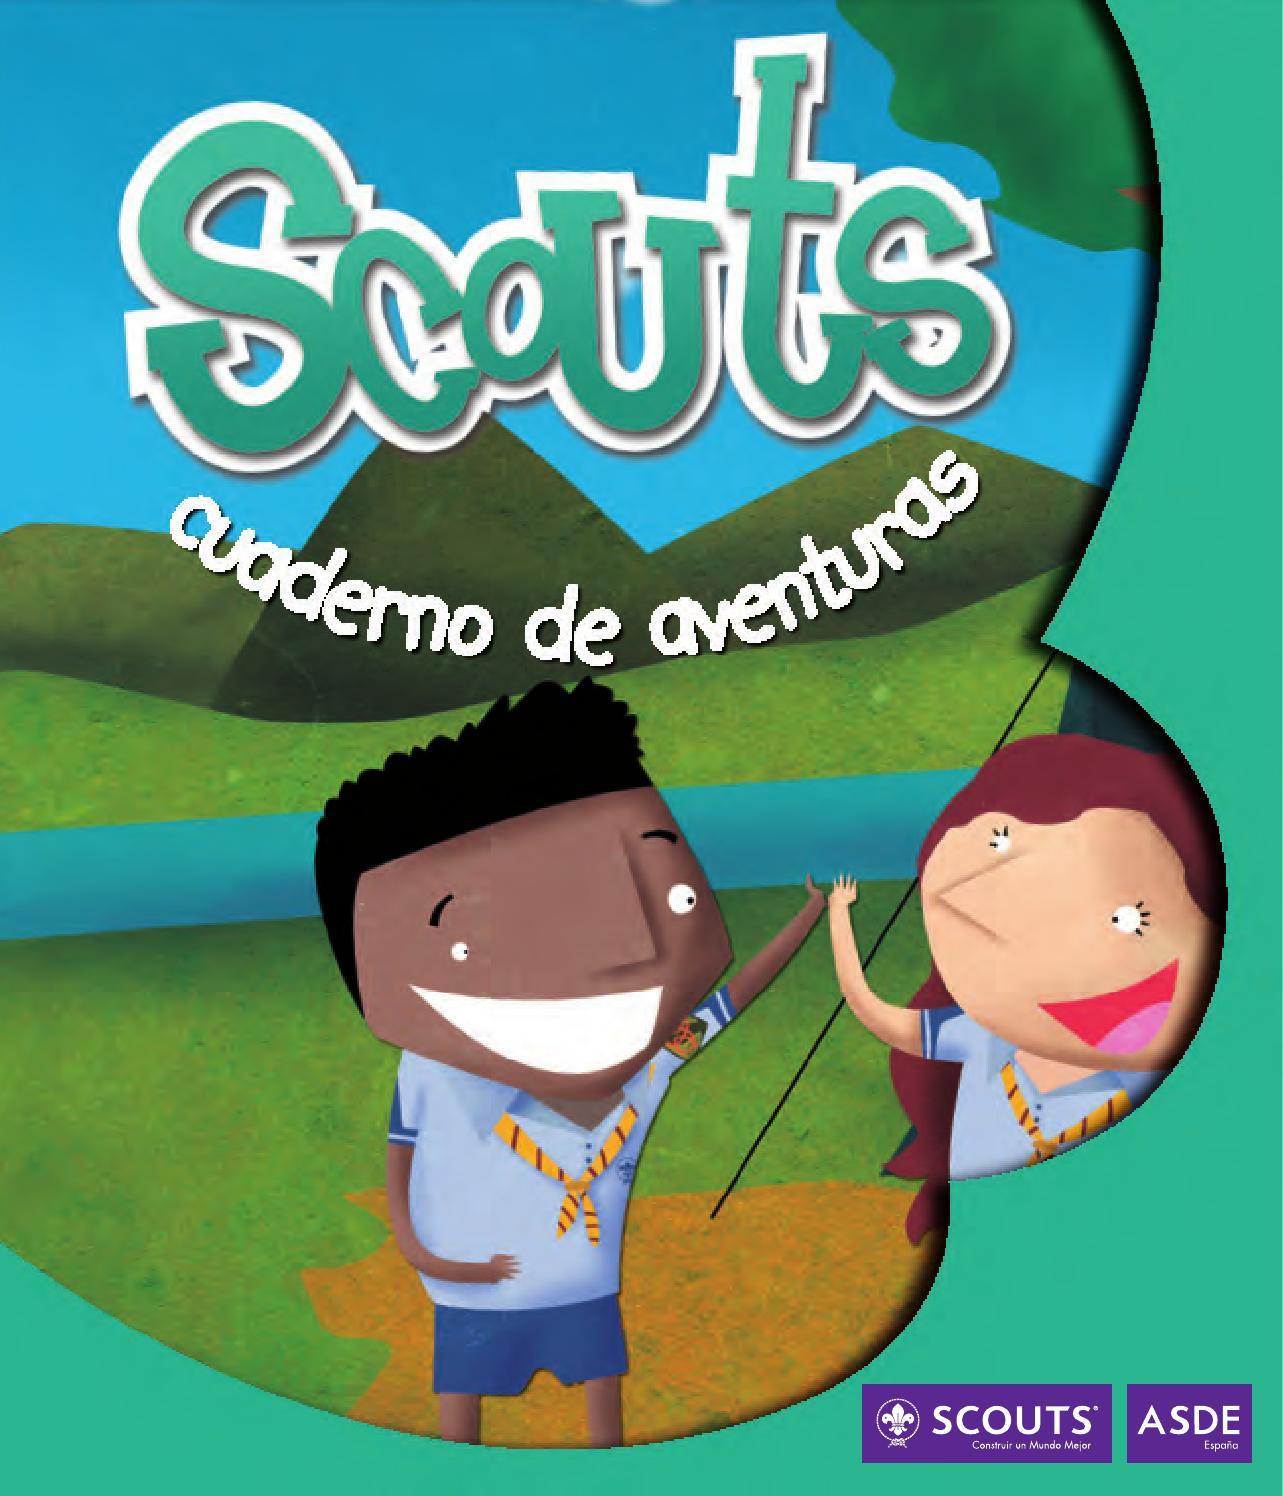 85c947d62 Scouts by Scouts de España - issuu